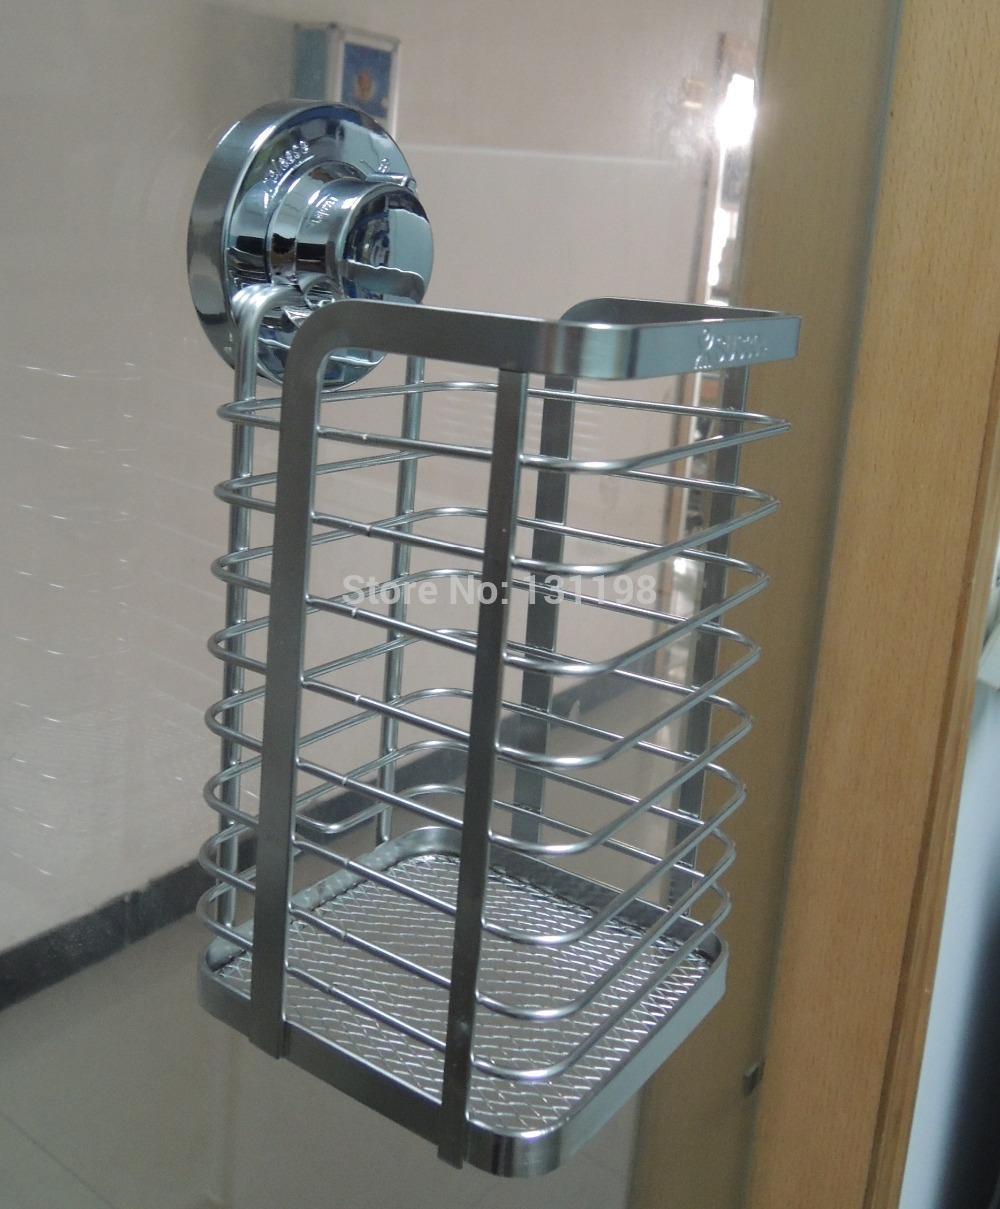 304 Stainless Steel Suction hanger utensil holder kitchen accessories